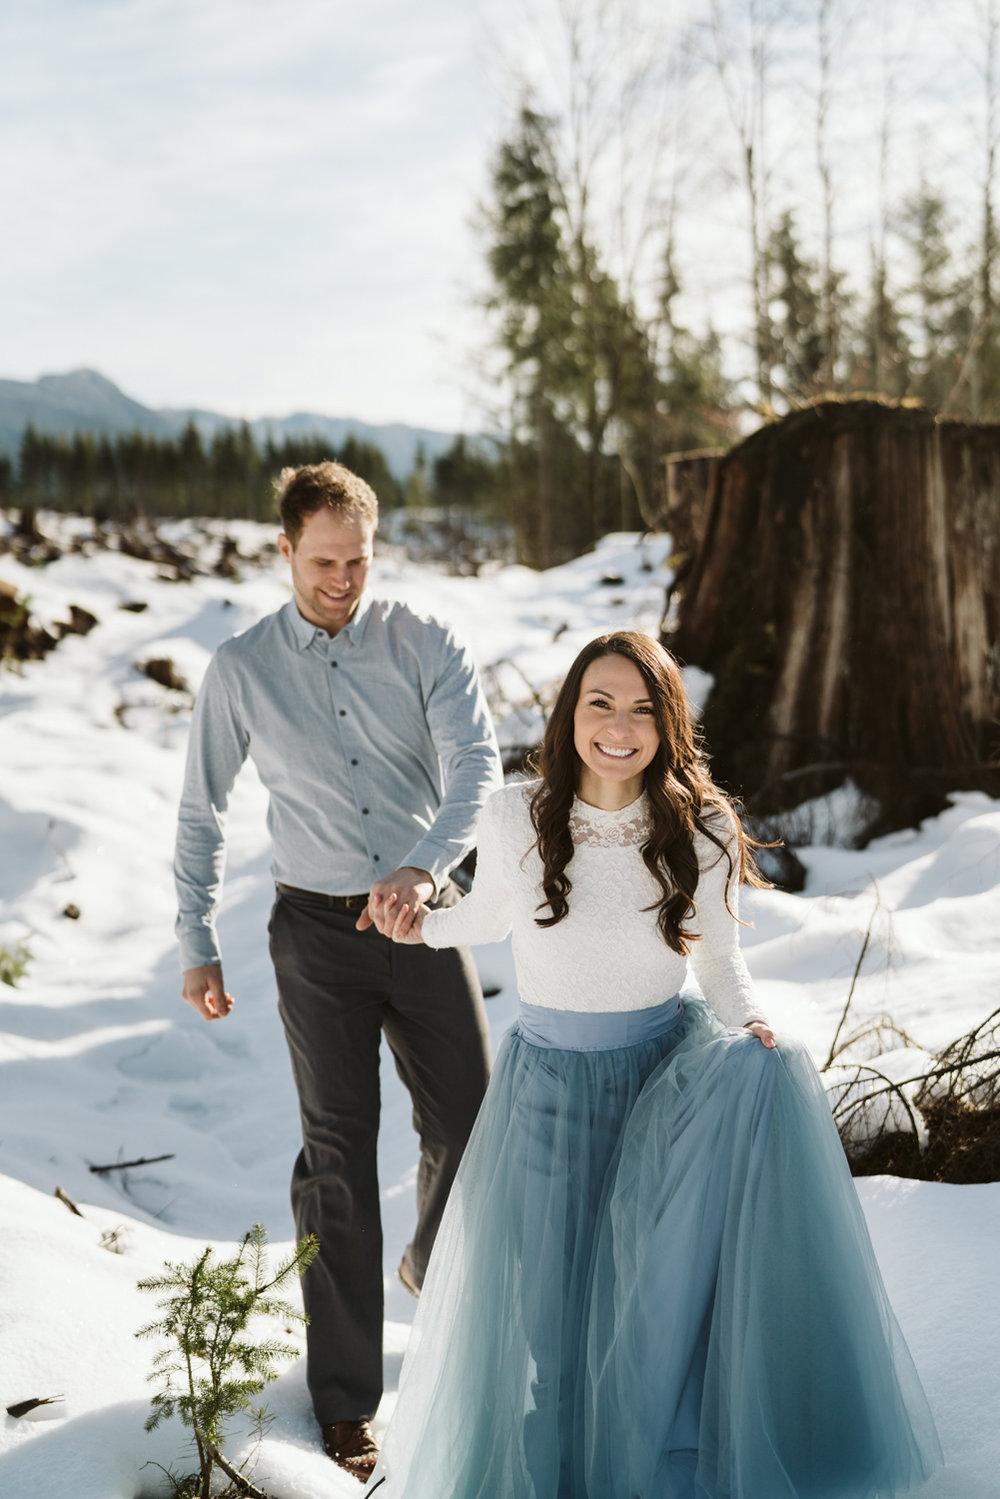 April Yentas Photography - Ethan & Nerissa-35.jpg